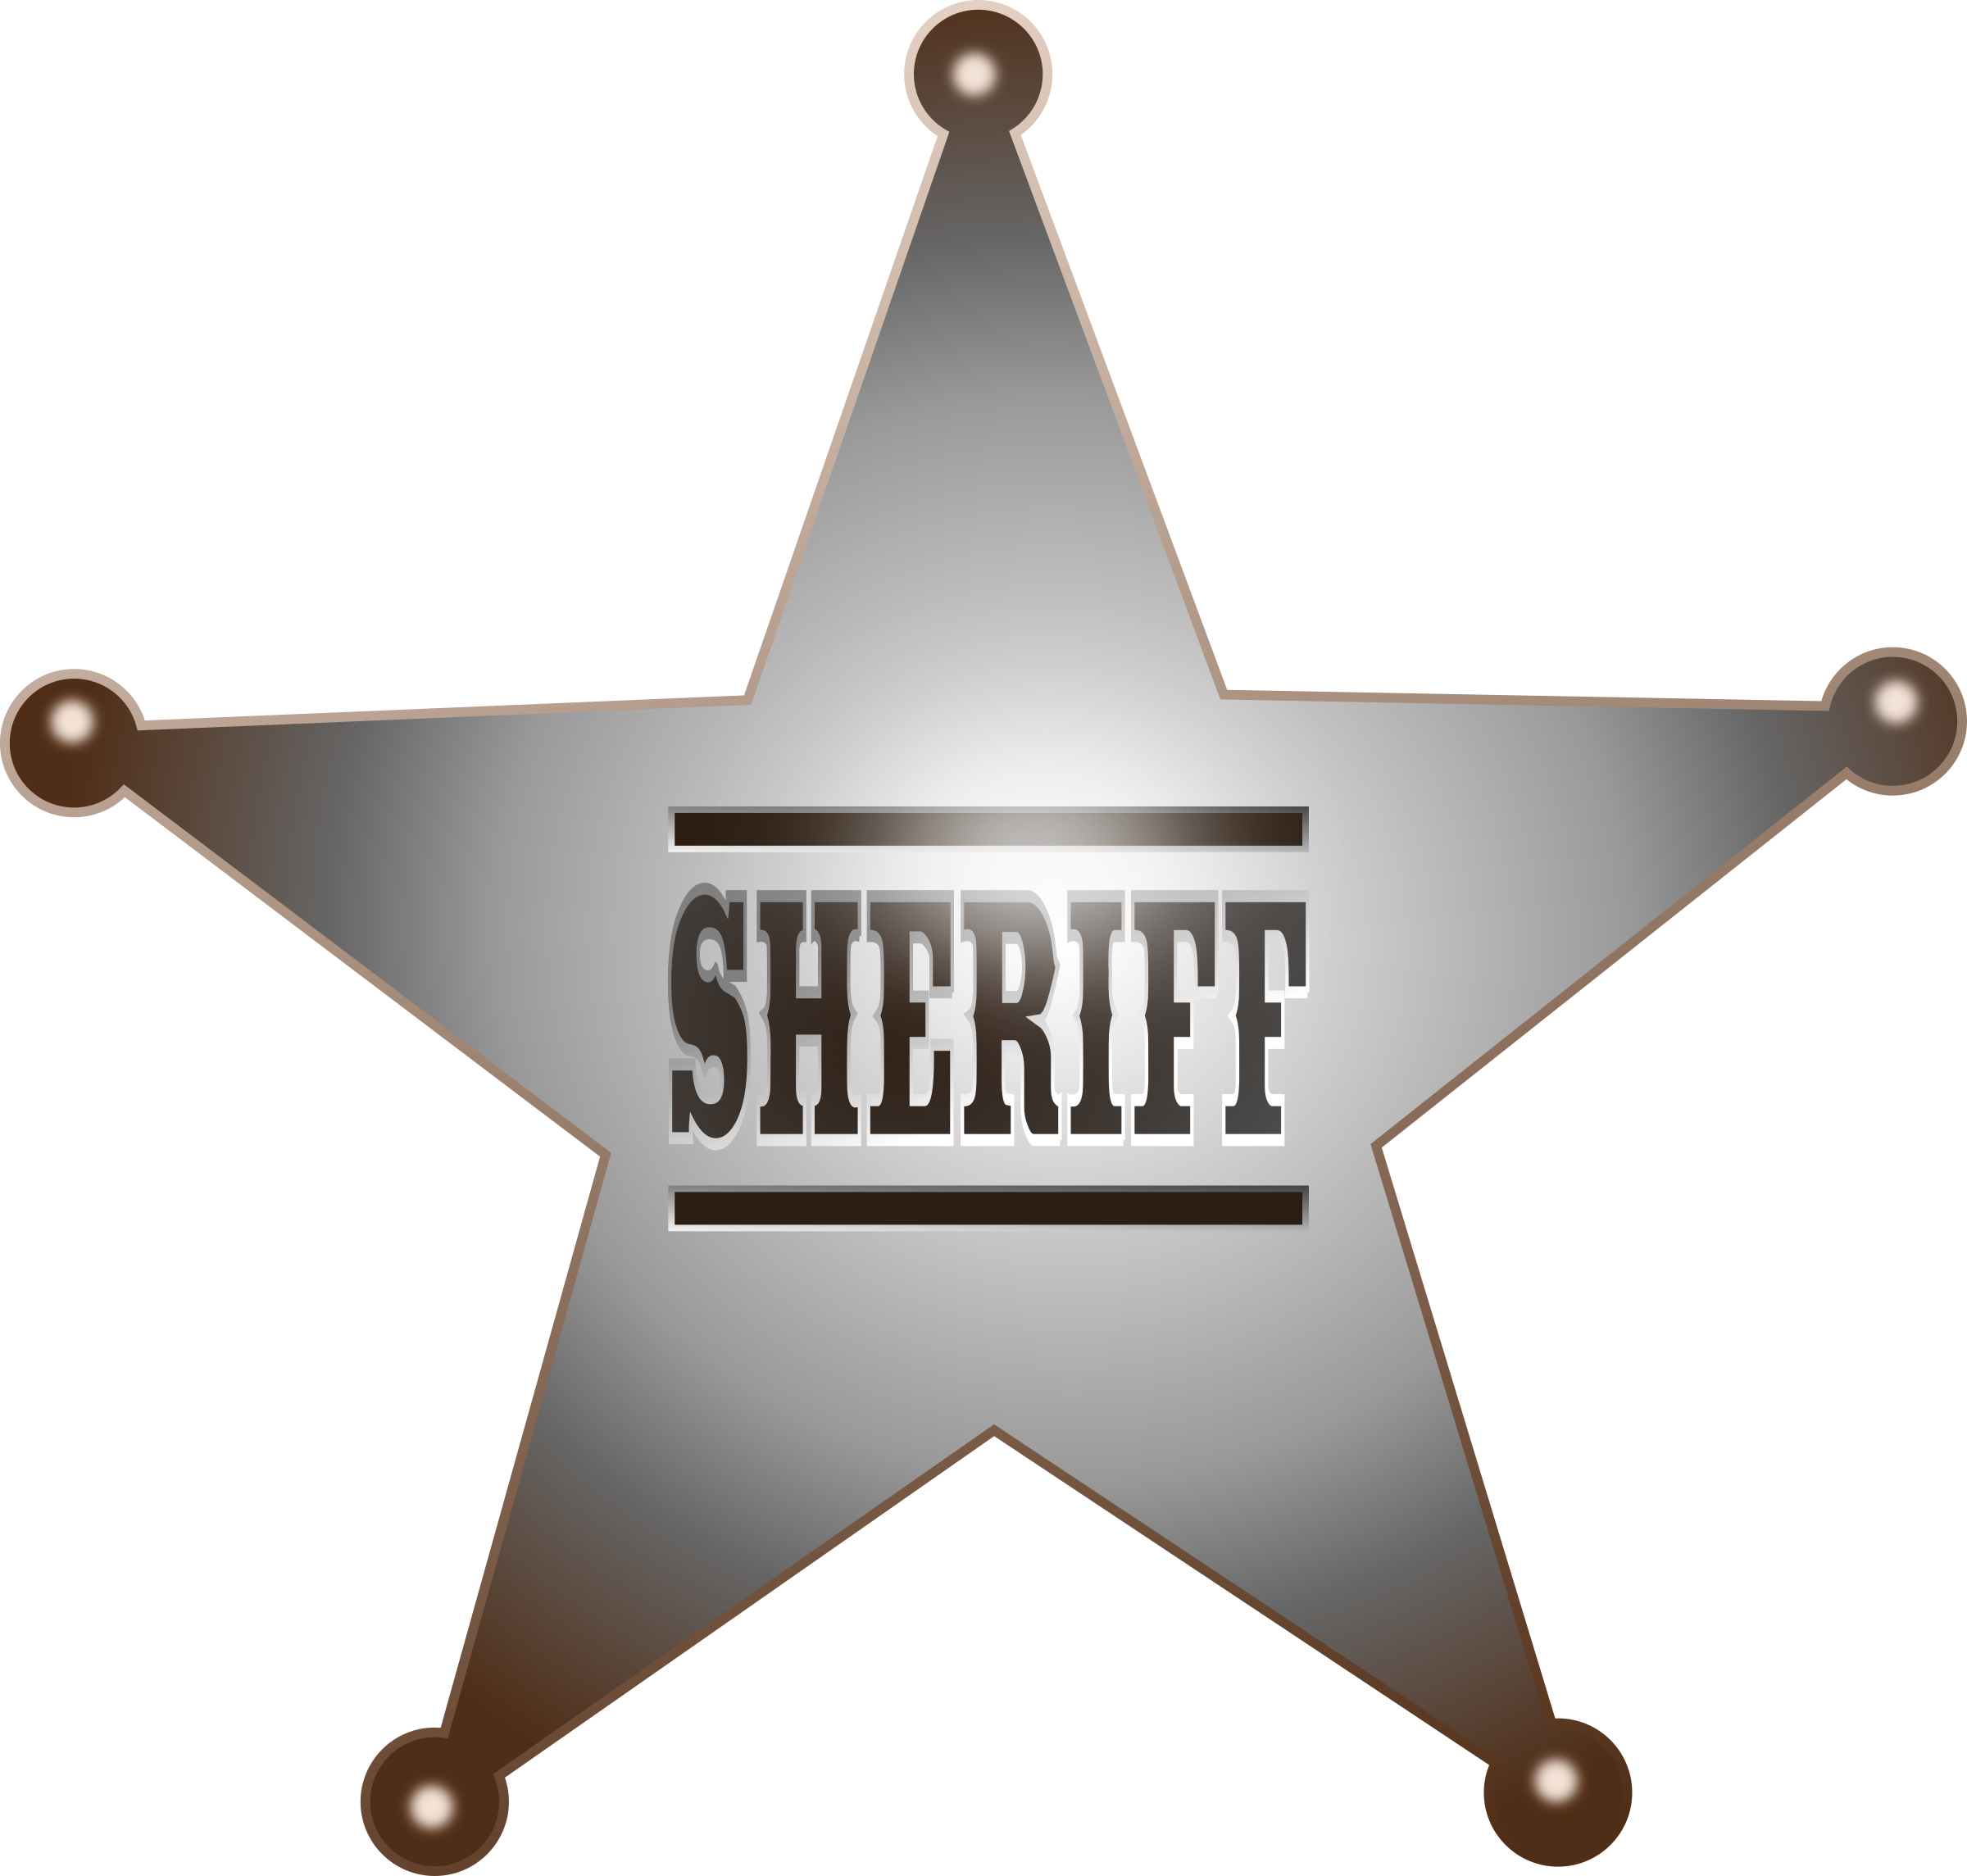 Clipart stars sherrif. Sheriff star big image